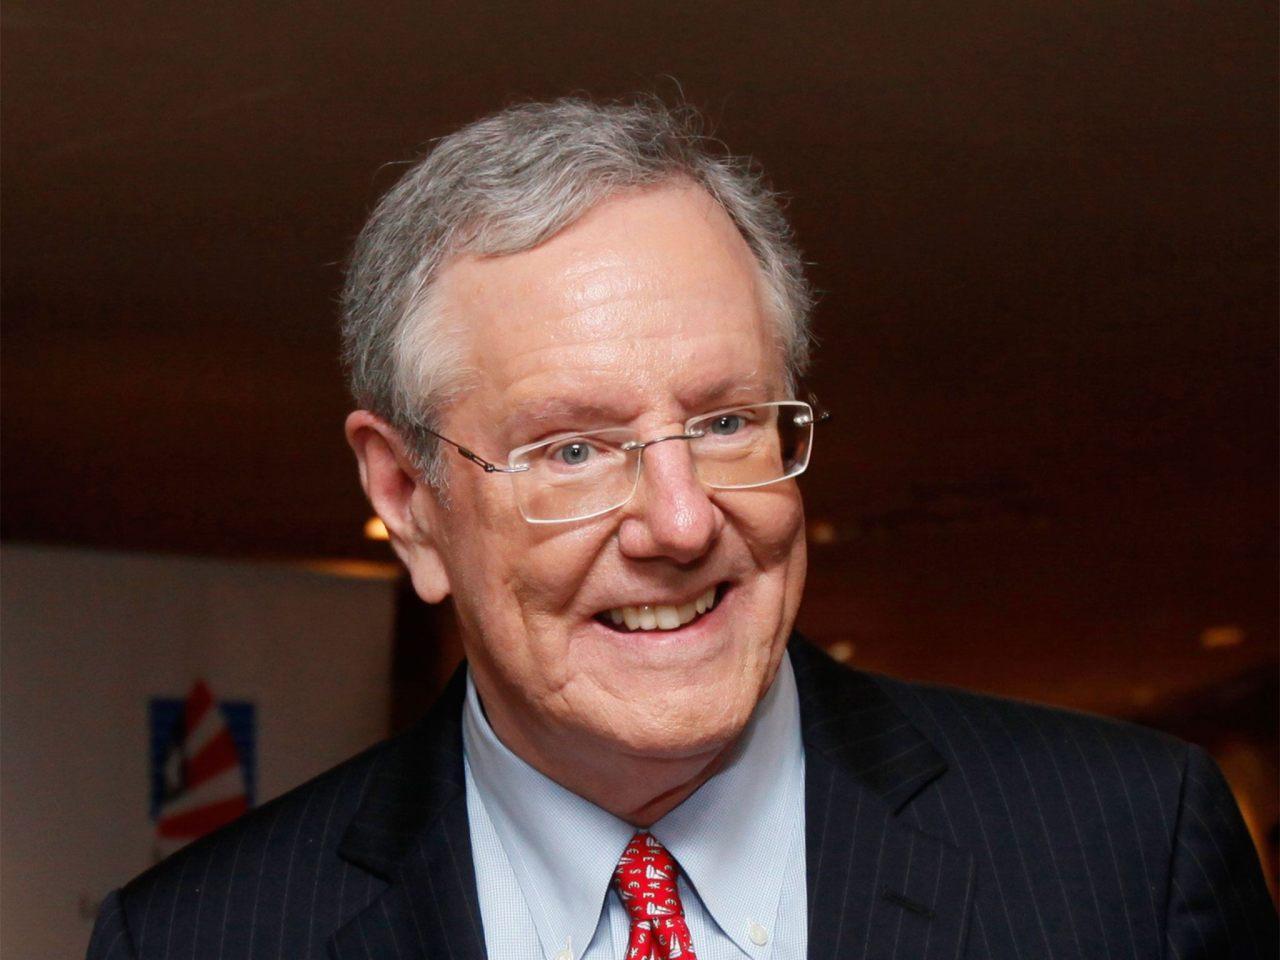 Steve Forbes Net Worth